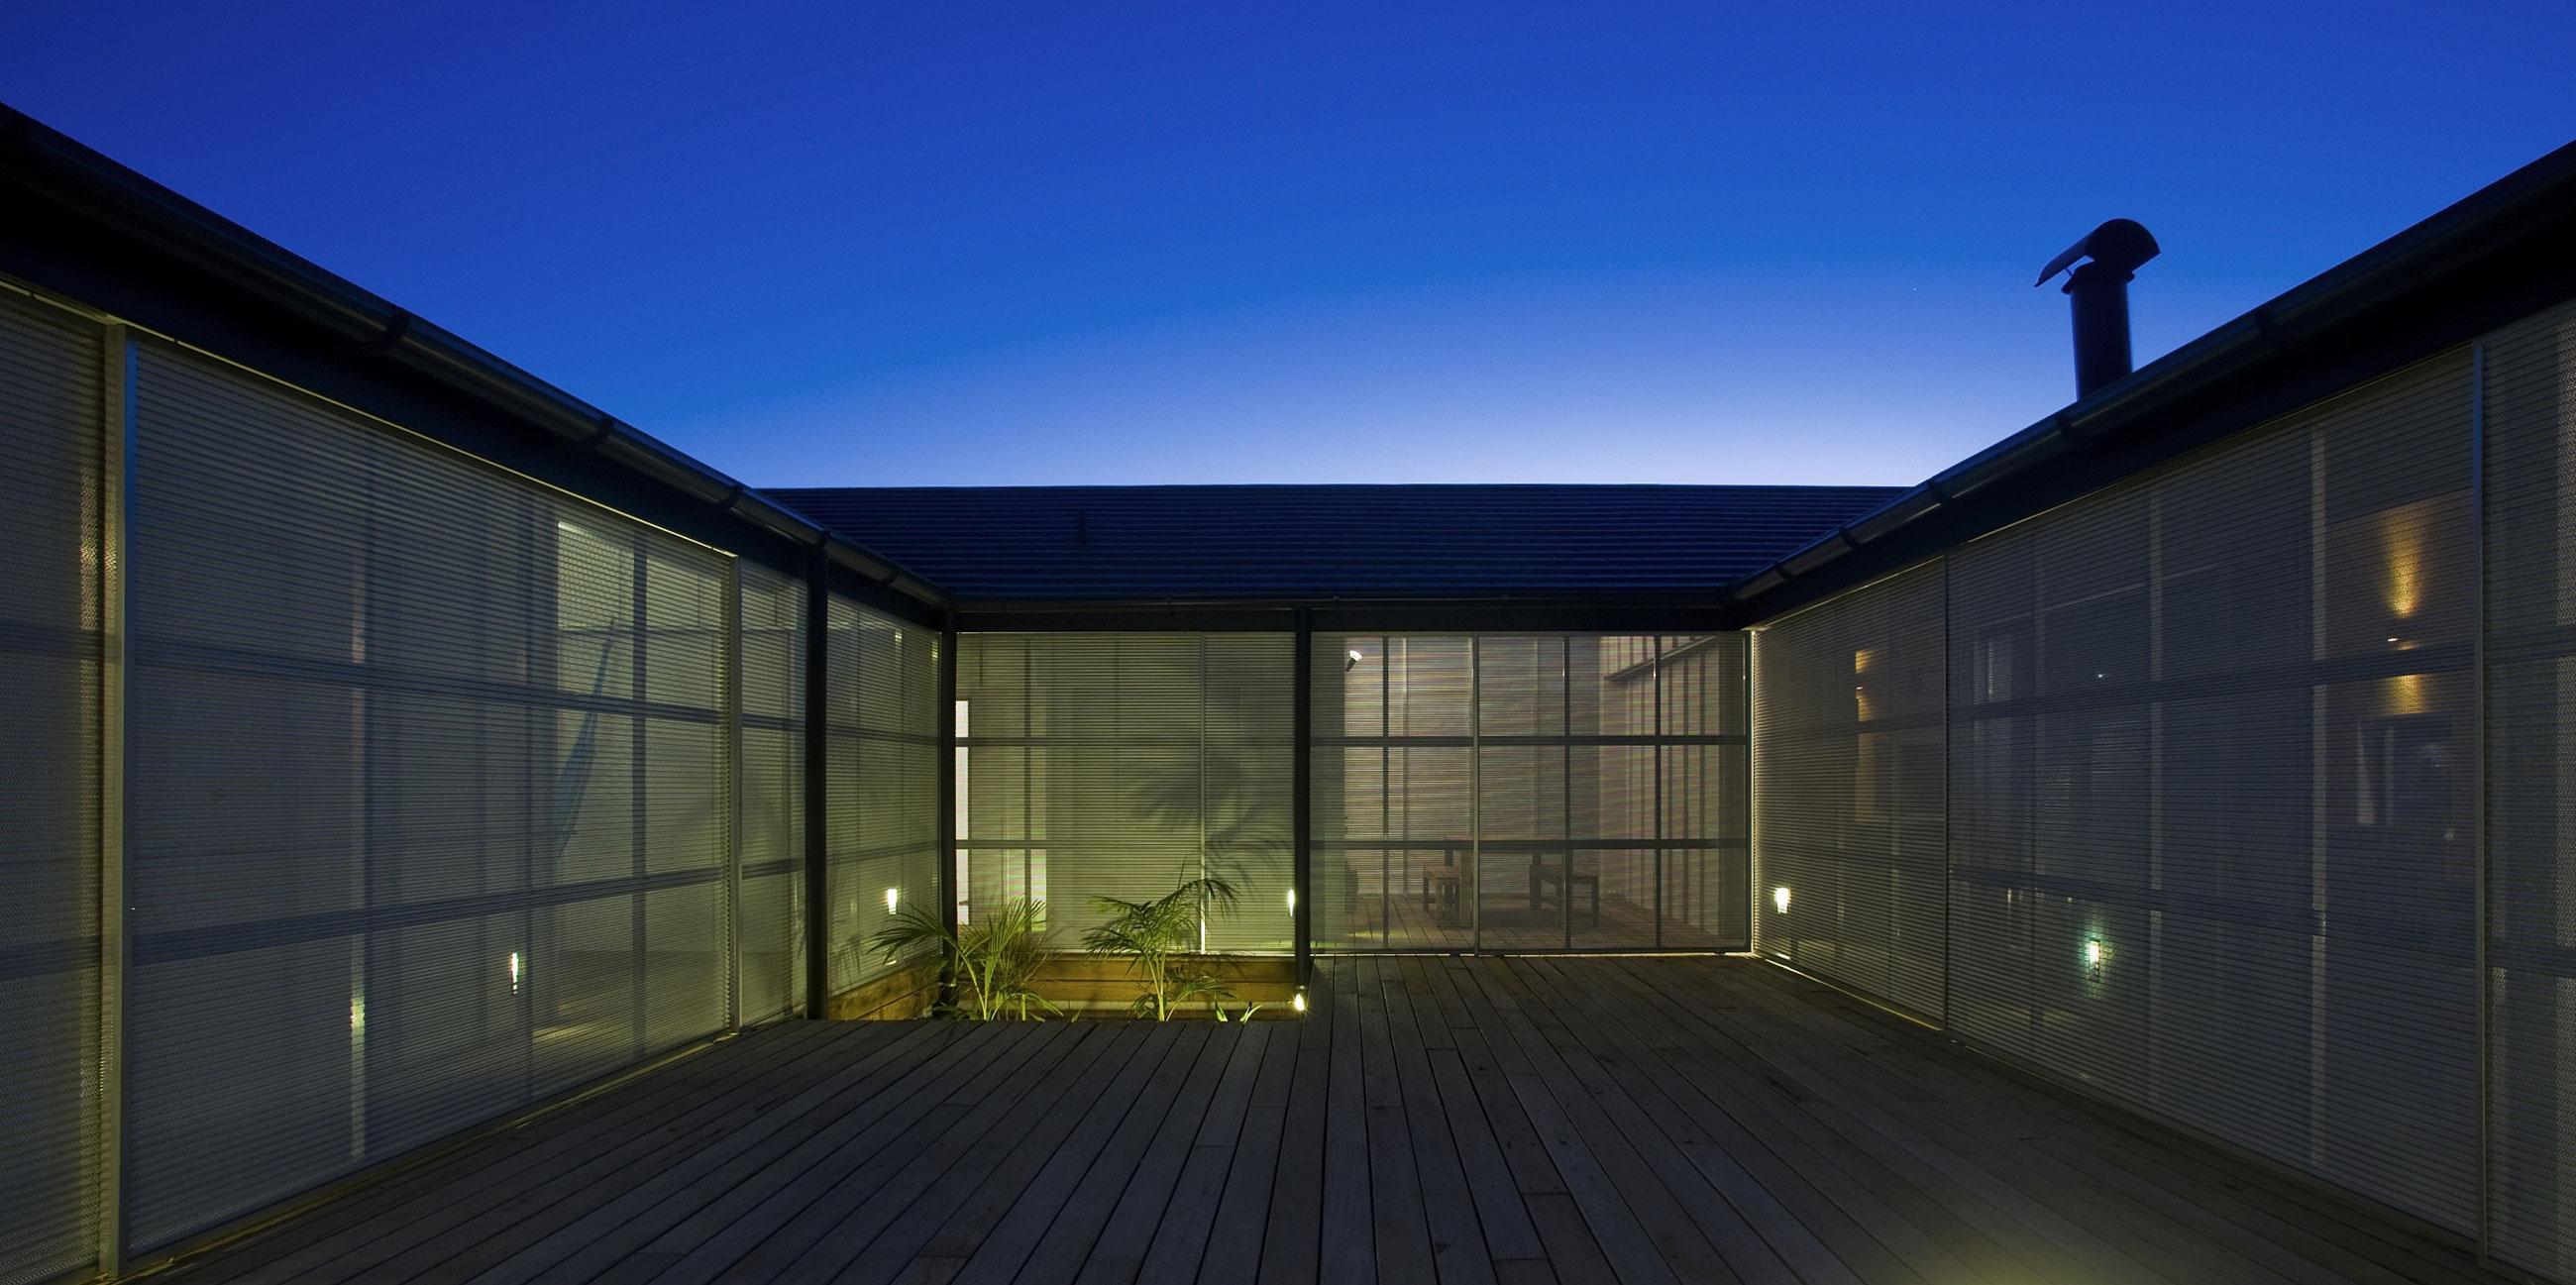 Diamond Beach Australia  city photos gallery : Diamond Beach House by Bourne Blue Architecture | Homedezen